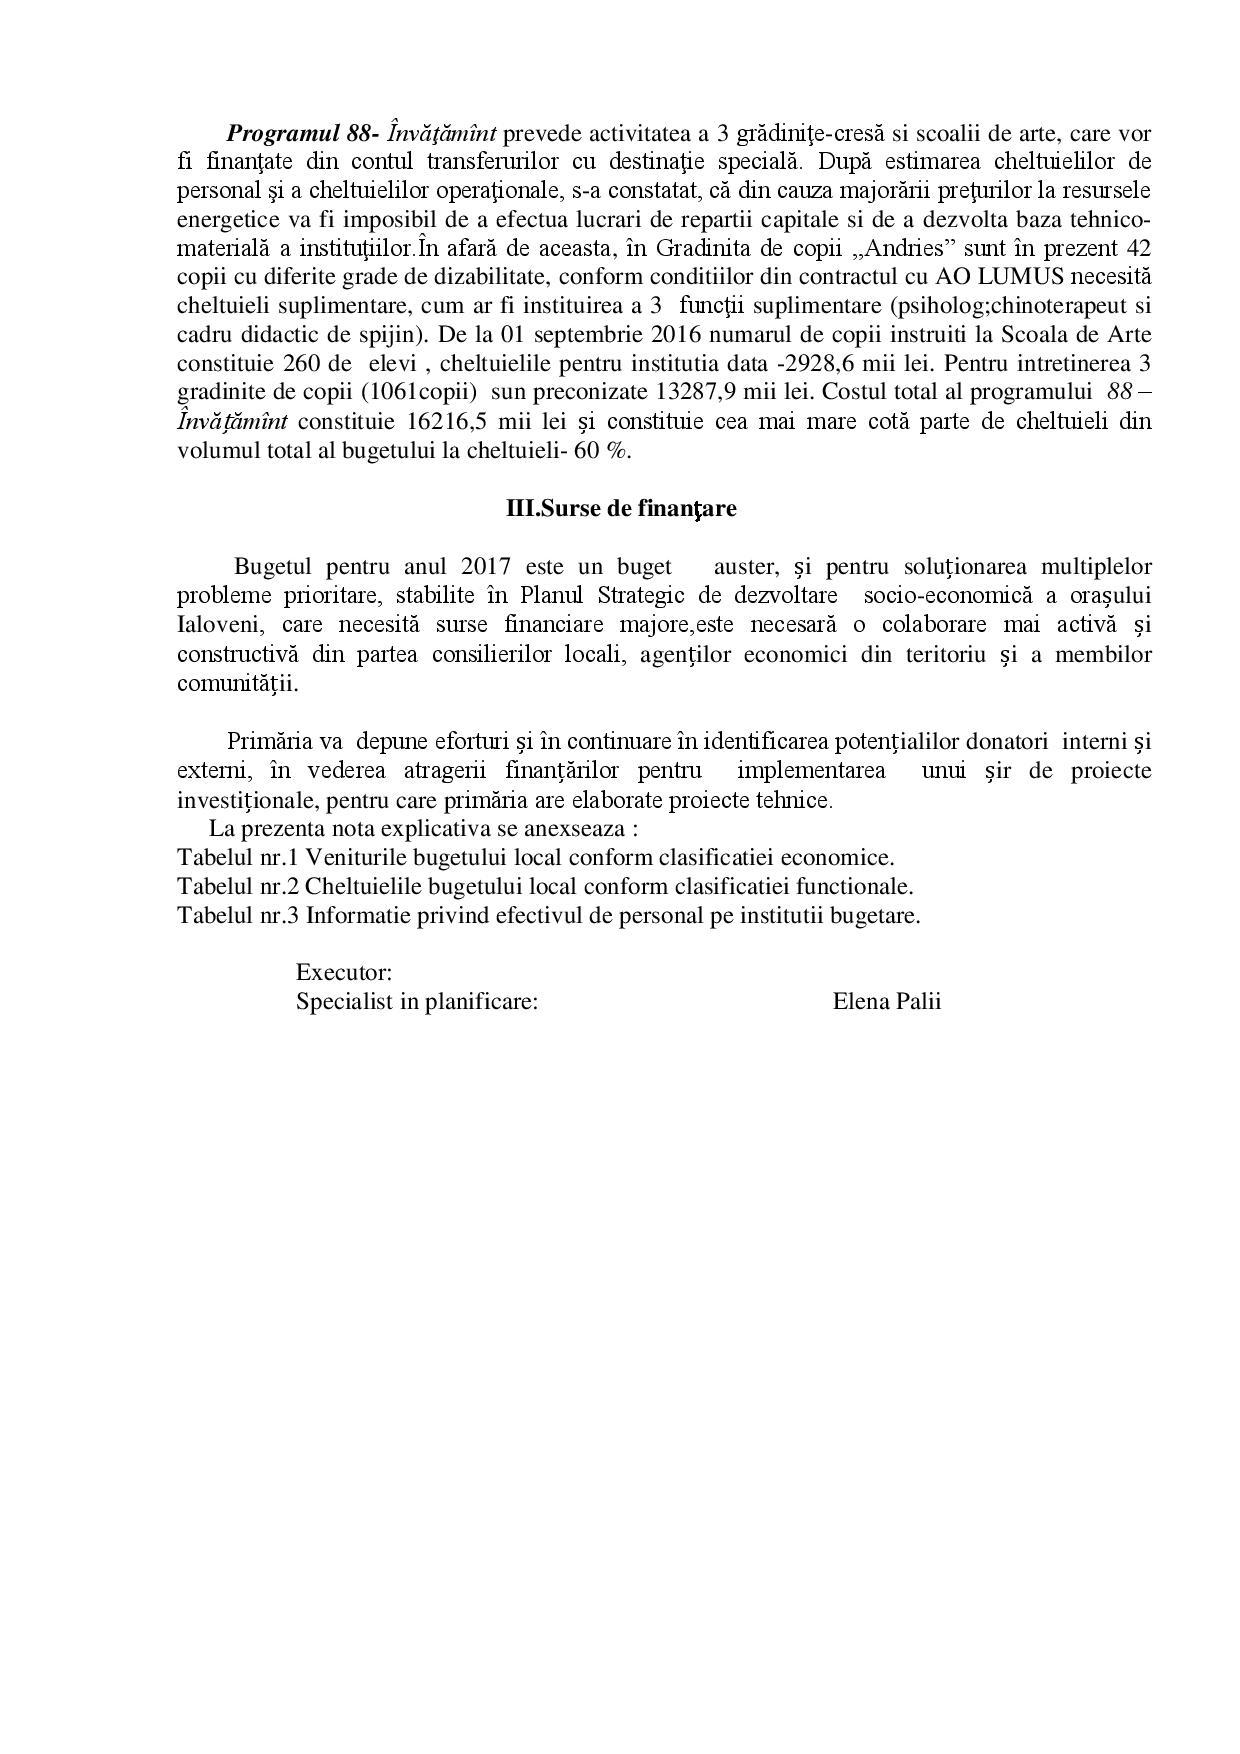 6158_nota-informativa-2017-page-005